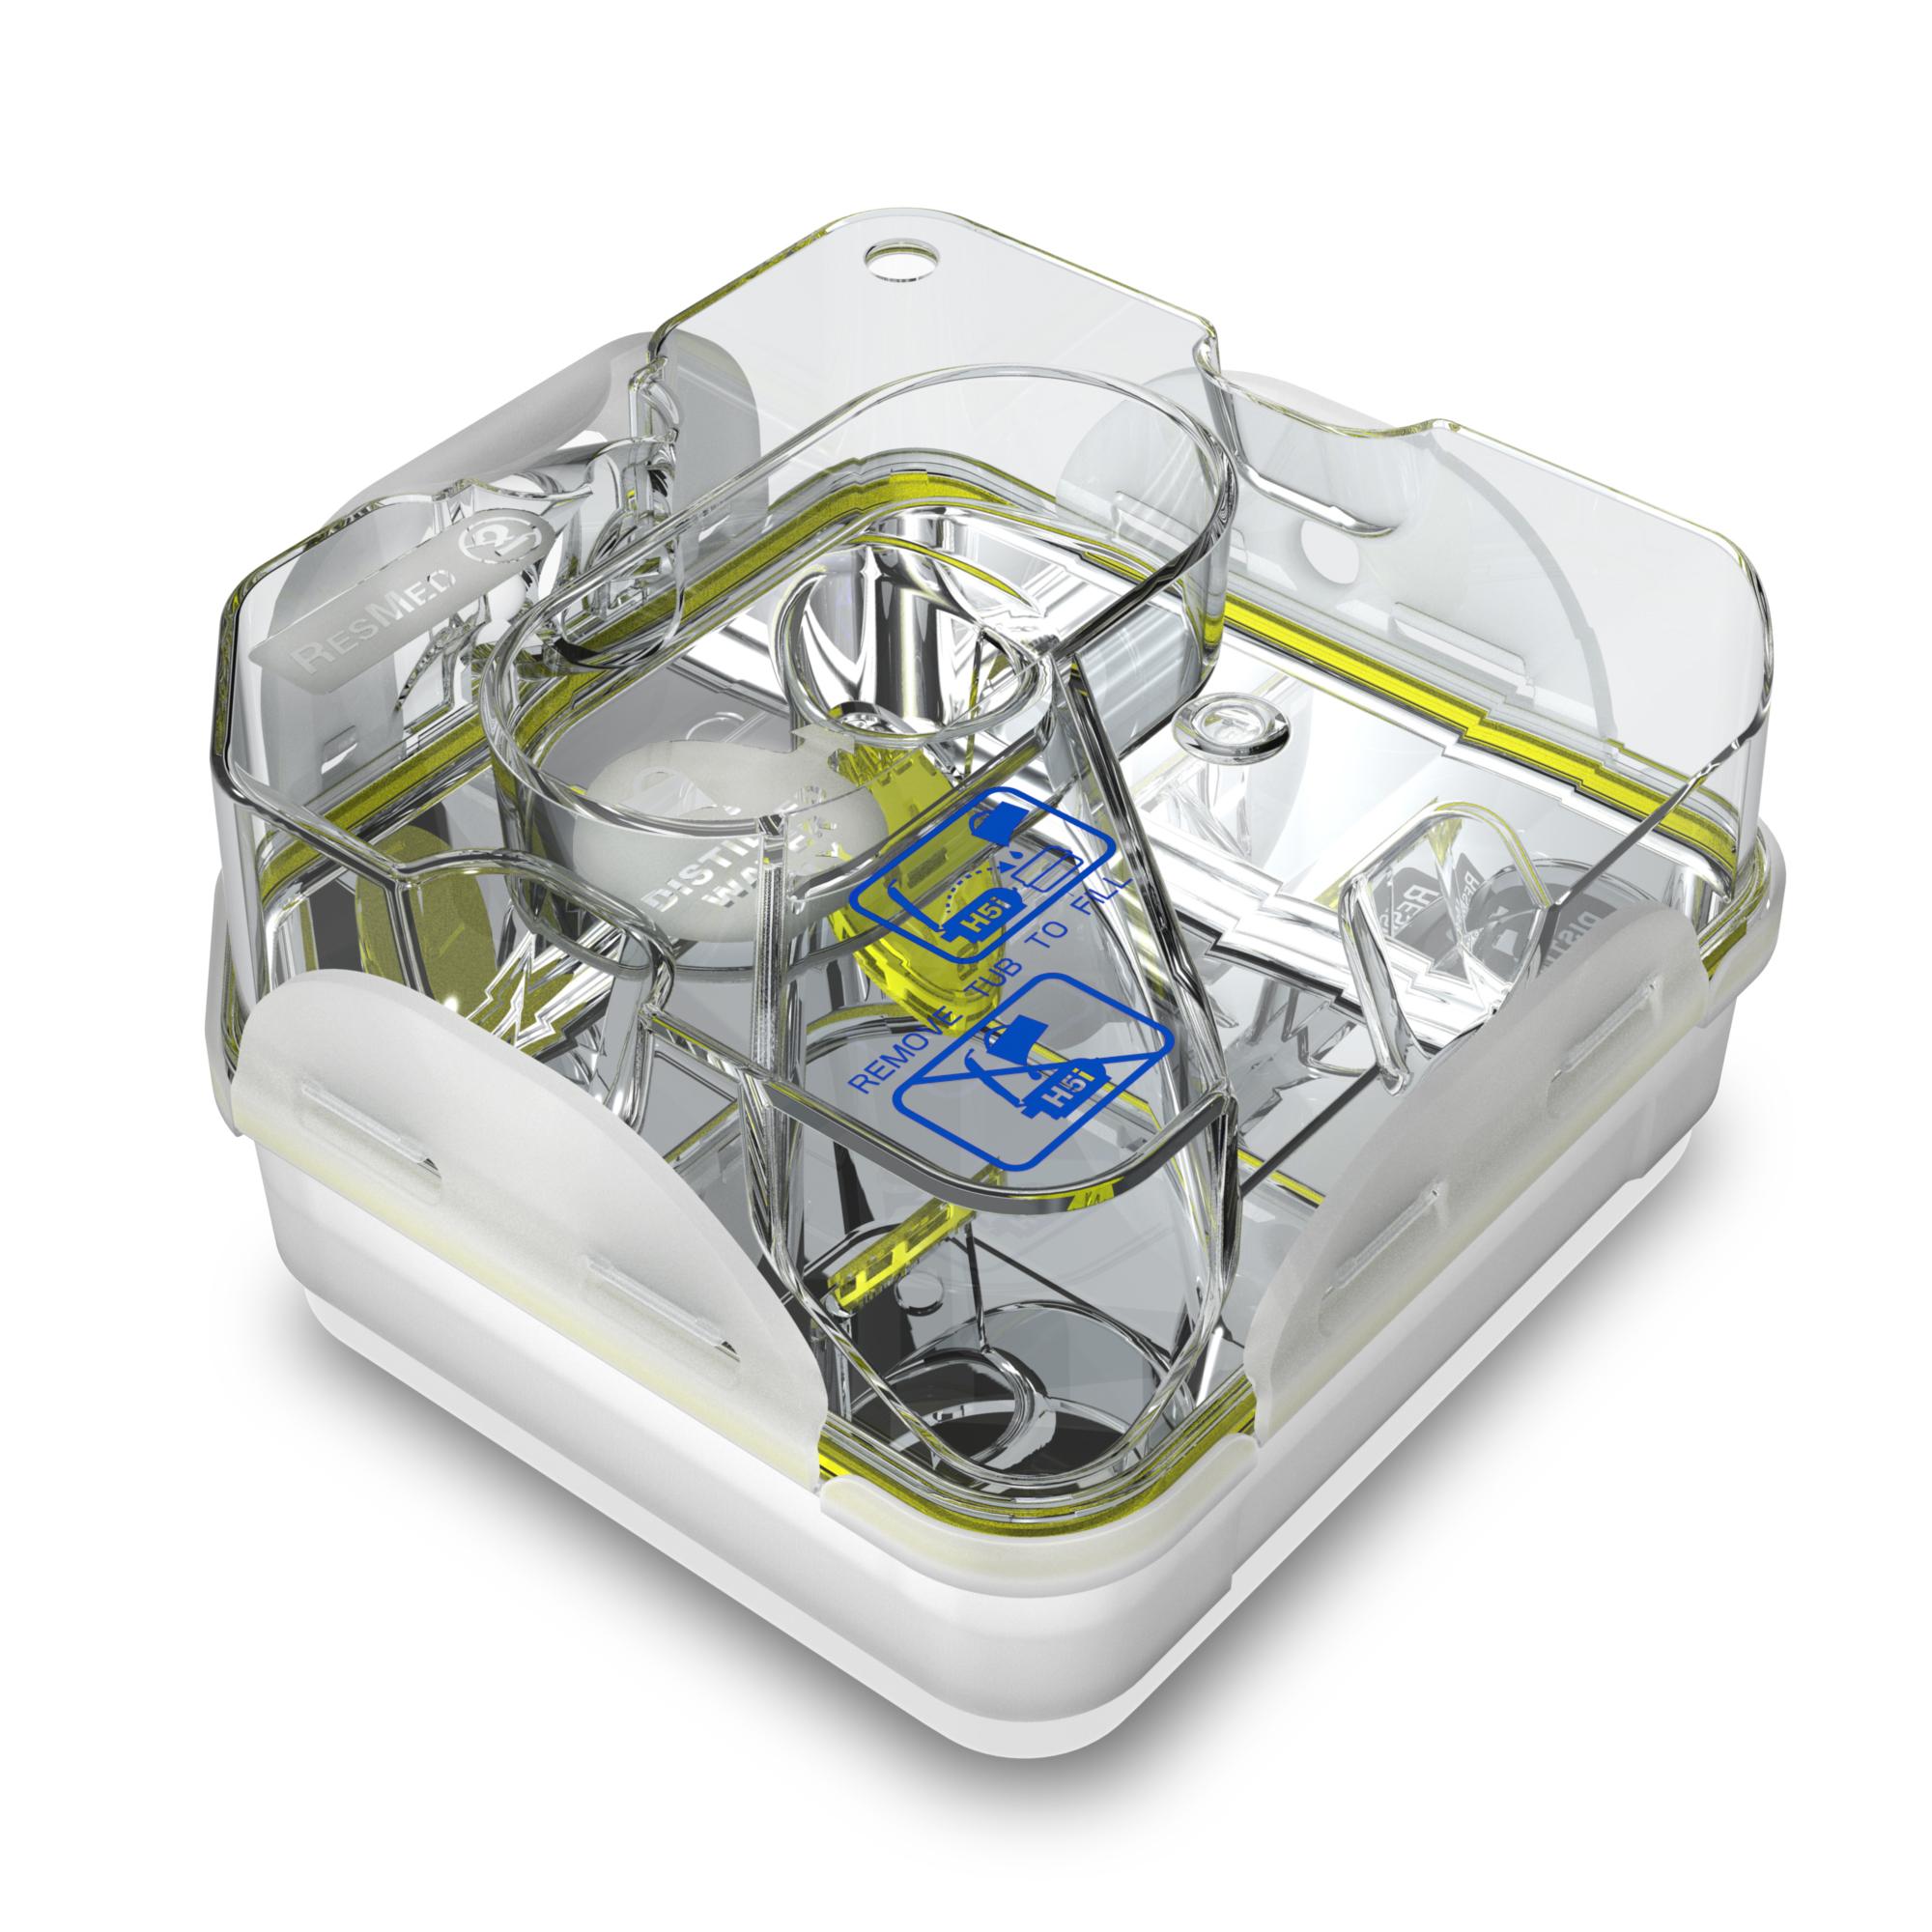 H5i-Disposable-Tub.web_